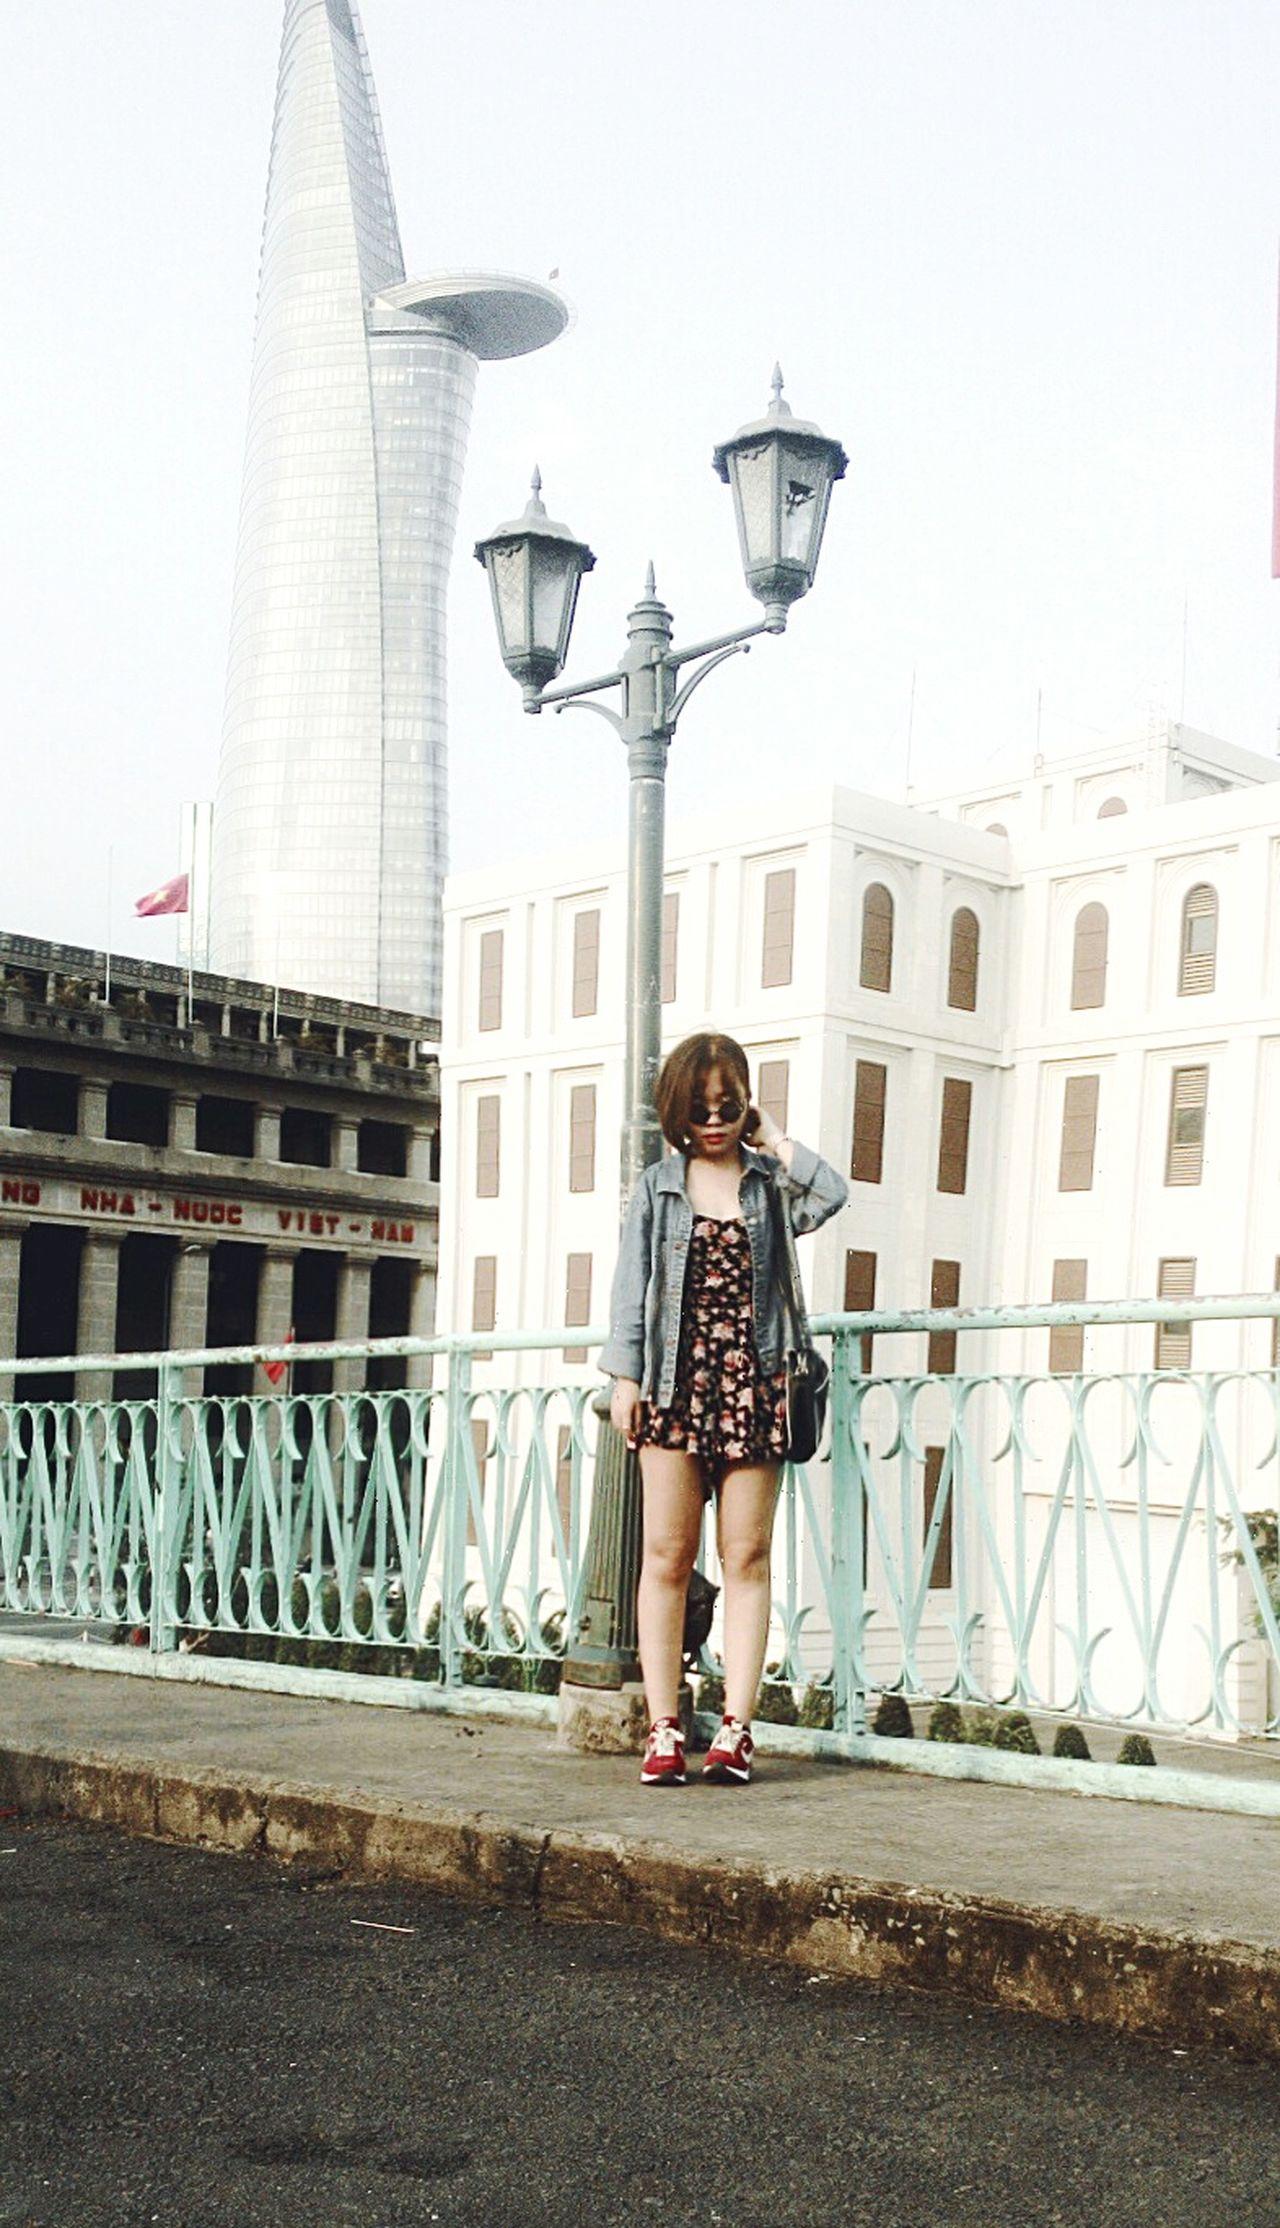 Saigon Bitexco Street Style Lookbookfashion Denim Short Hair Nike Air Max Jumpsuit Sunglasses